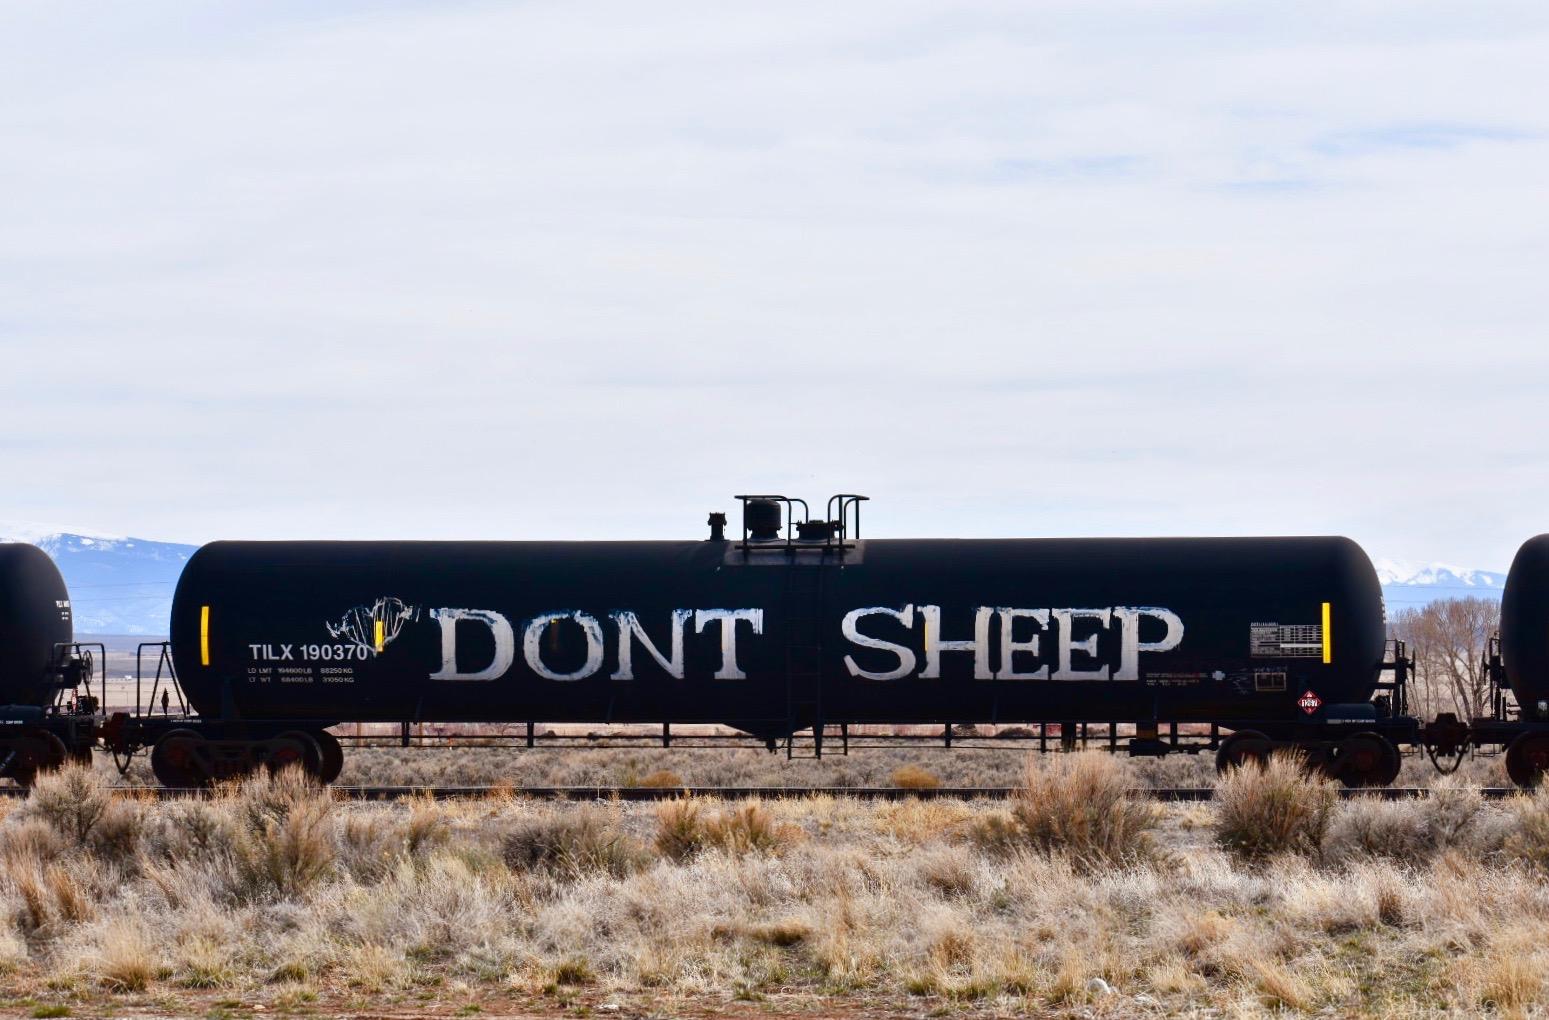 Don't Sheep,  near Monte Vista, CO